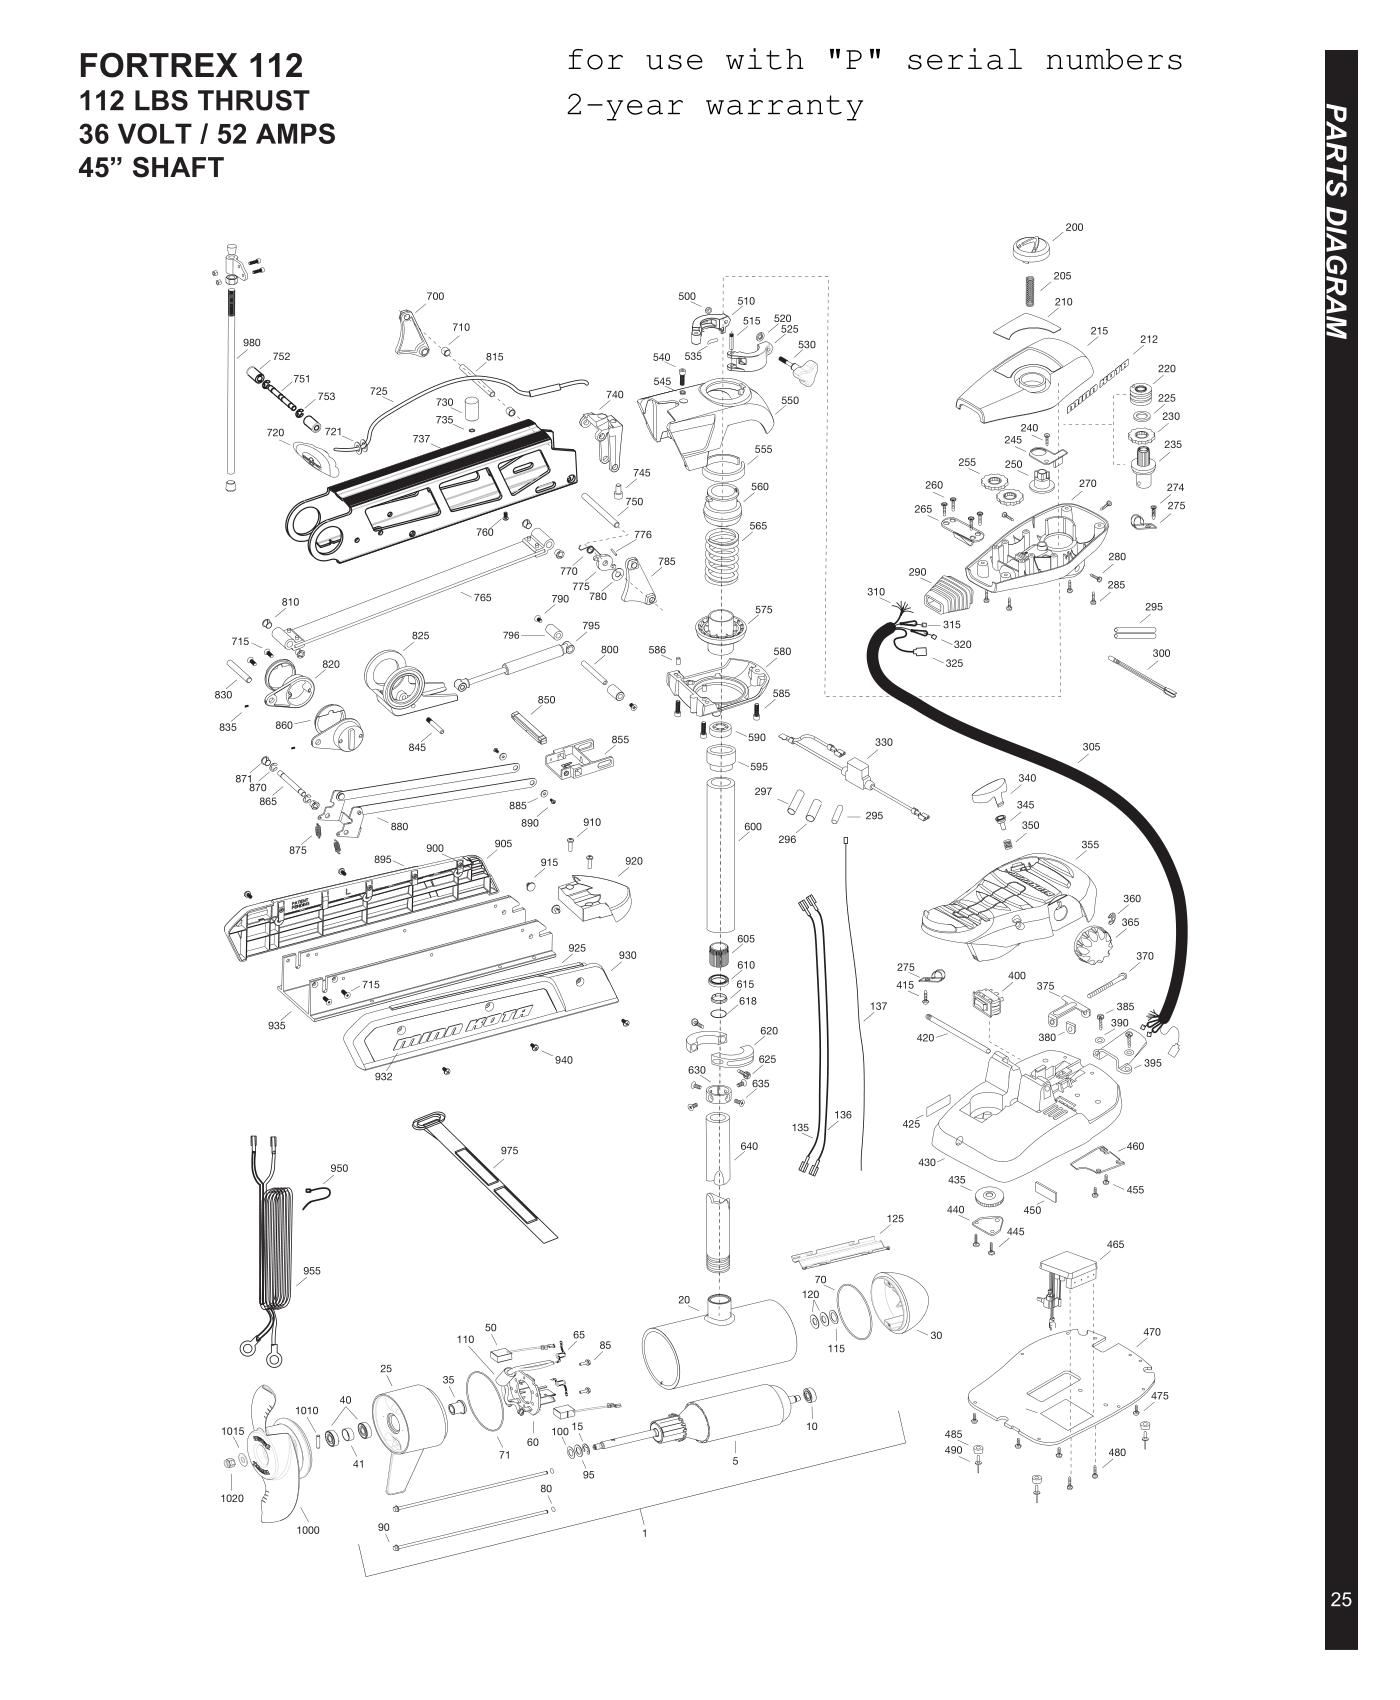 Minn Kota Fortrex 112 45 Inch Parts 2015 From Kayak Trolling Motor Wiring Diagram Mk Fortrex112 45inch 1